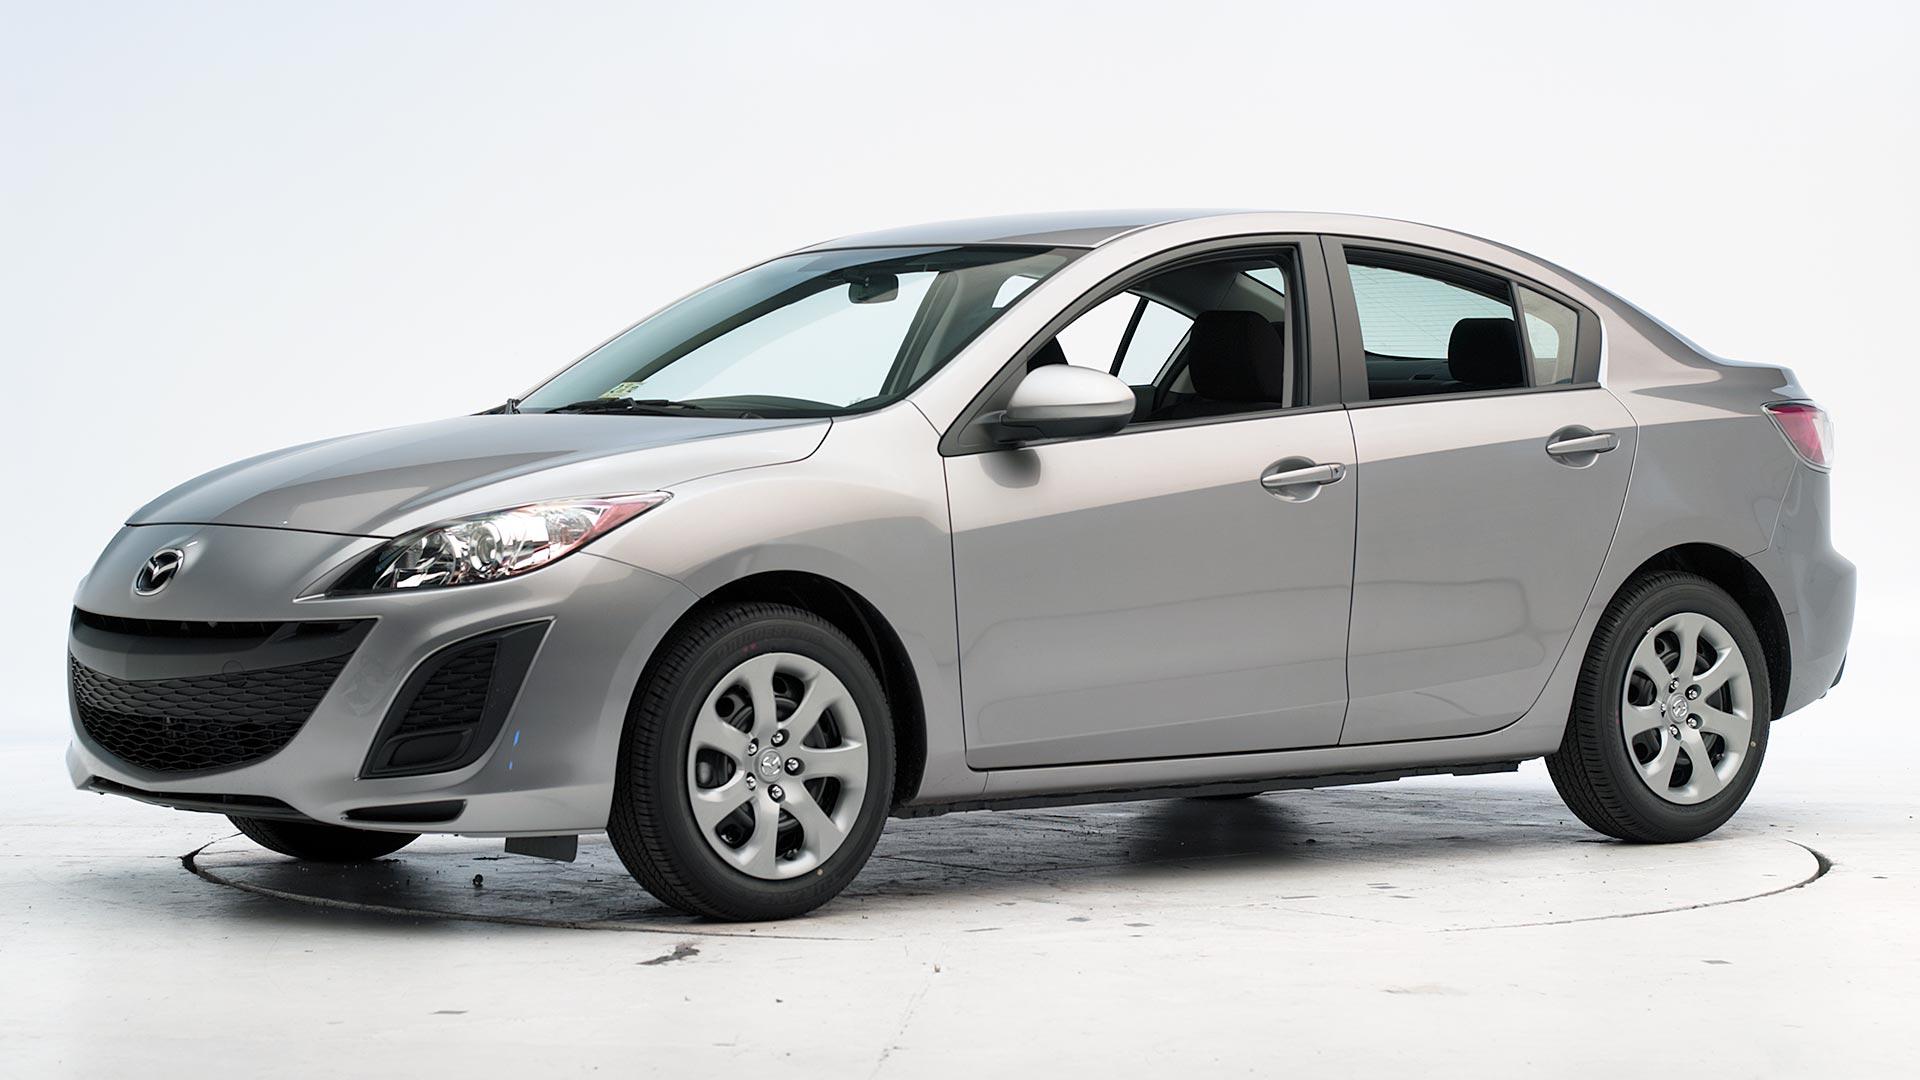 Kelebihan Mazda 3 2011 Tangguh